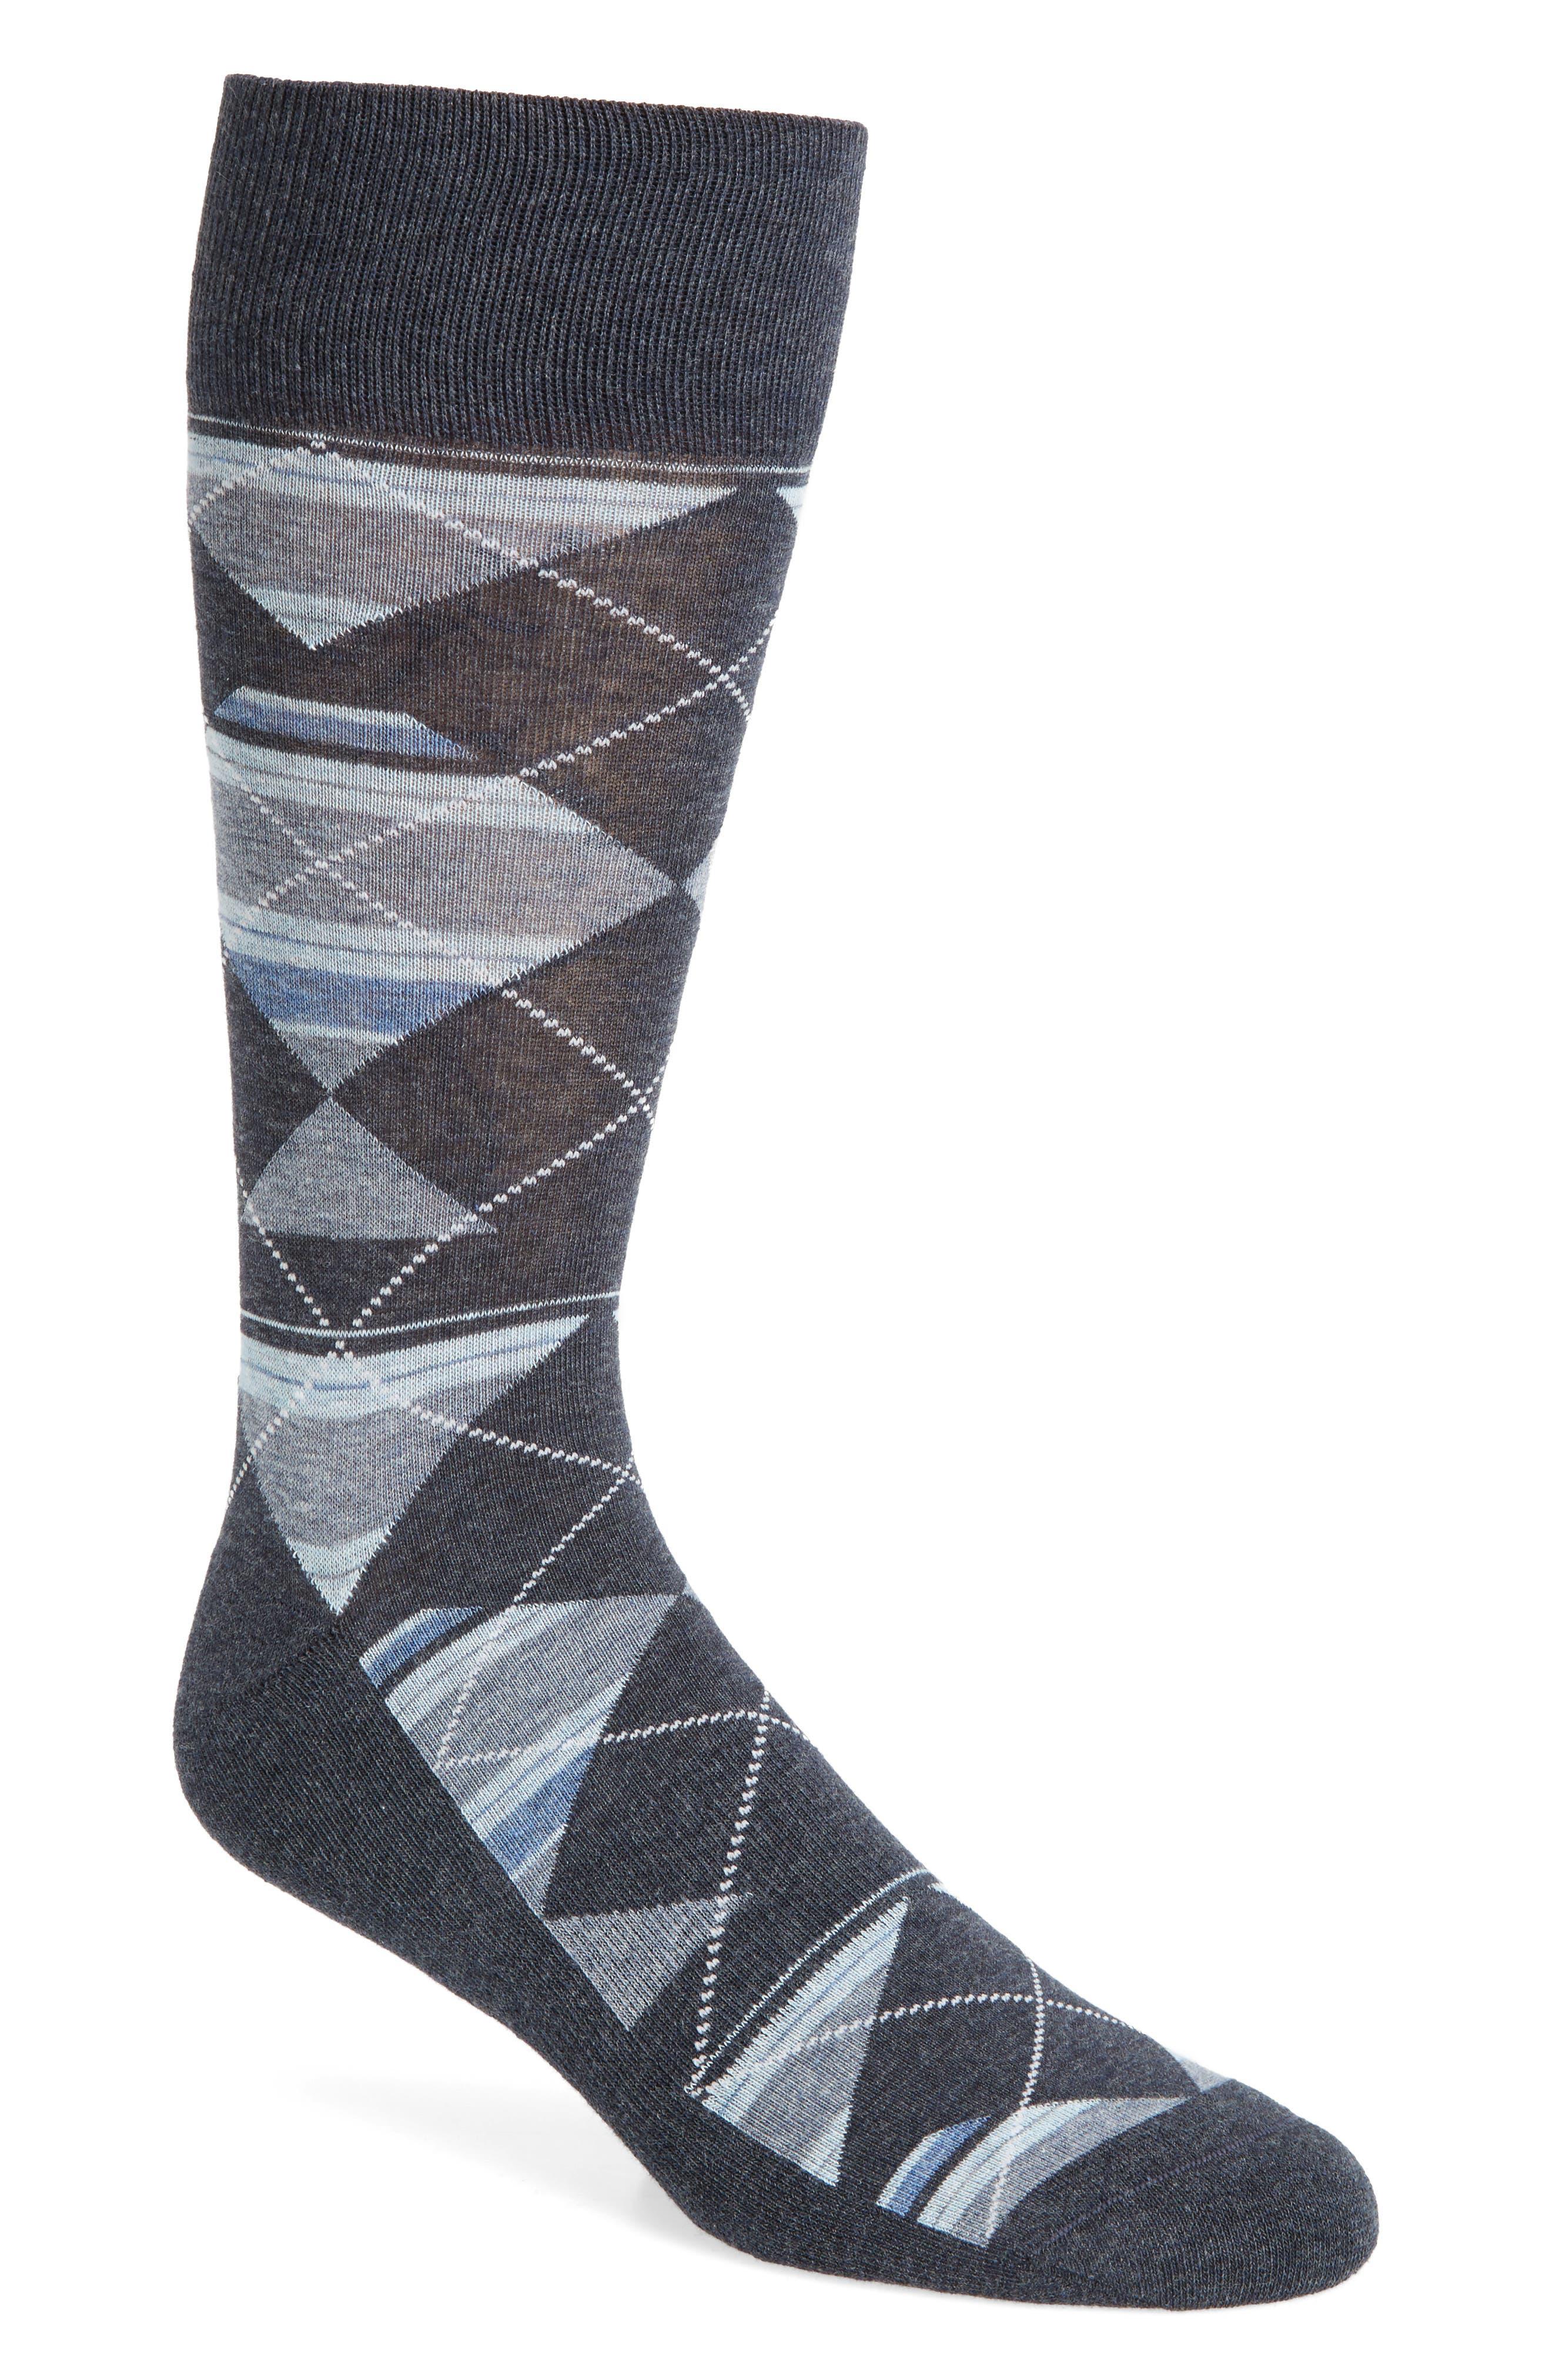 Alternate Image 1 Selected - Nordstrom Men's Shop Multistripe Argyle Socks